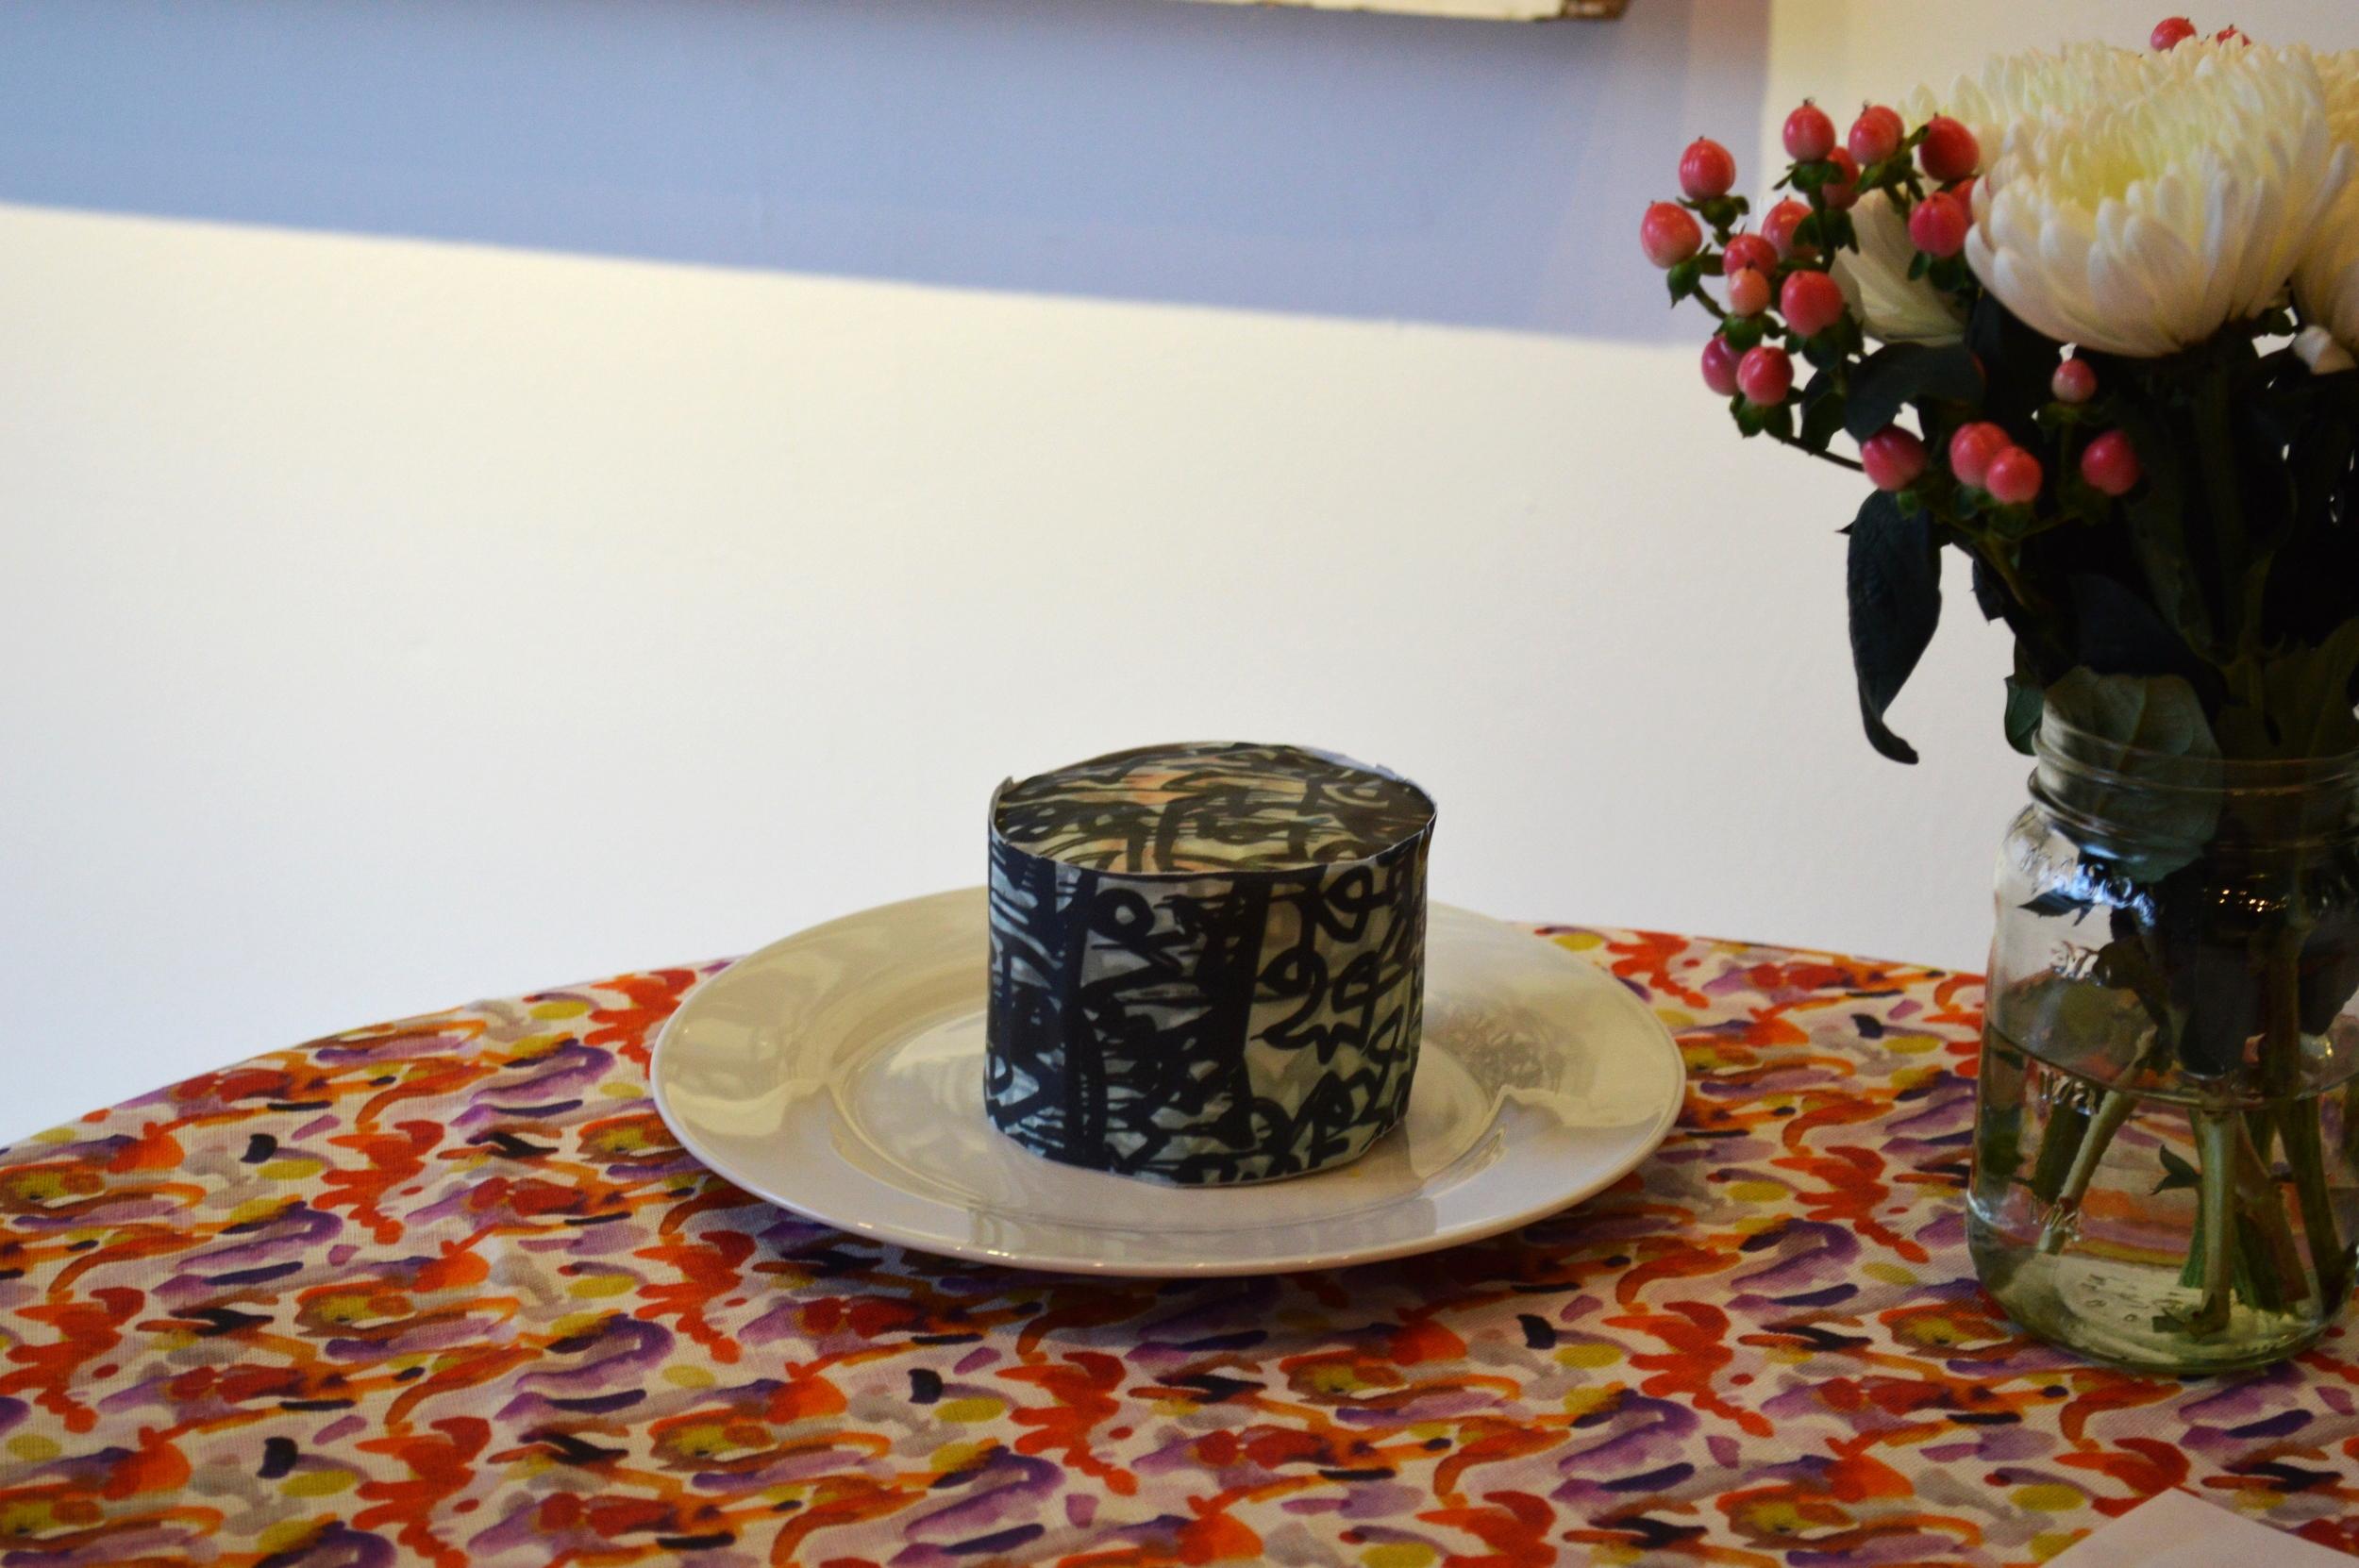 Chefanie's cake on Andra Eggleston's tablecloth